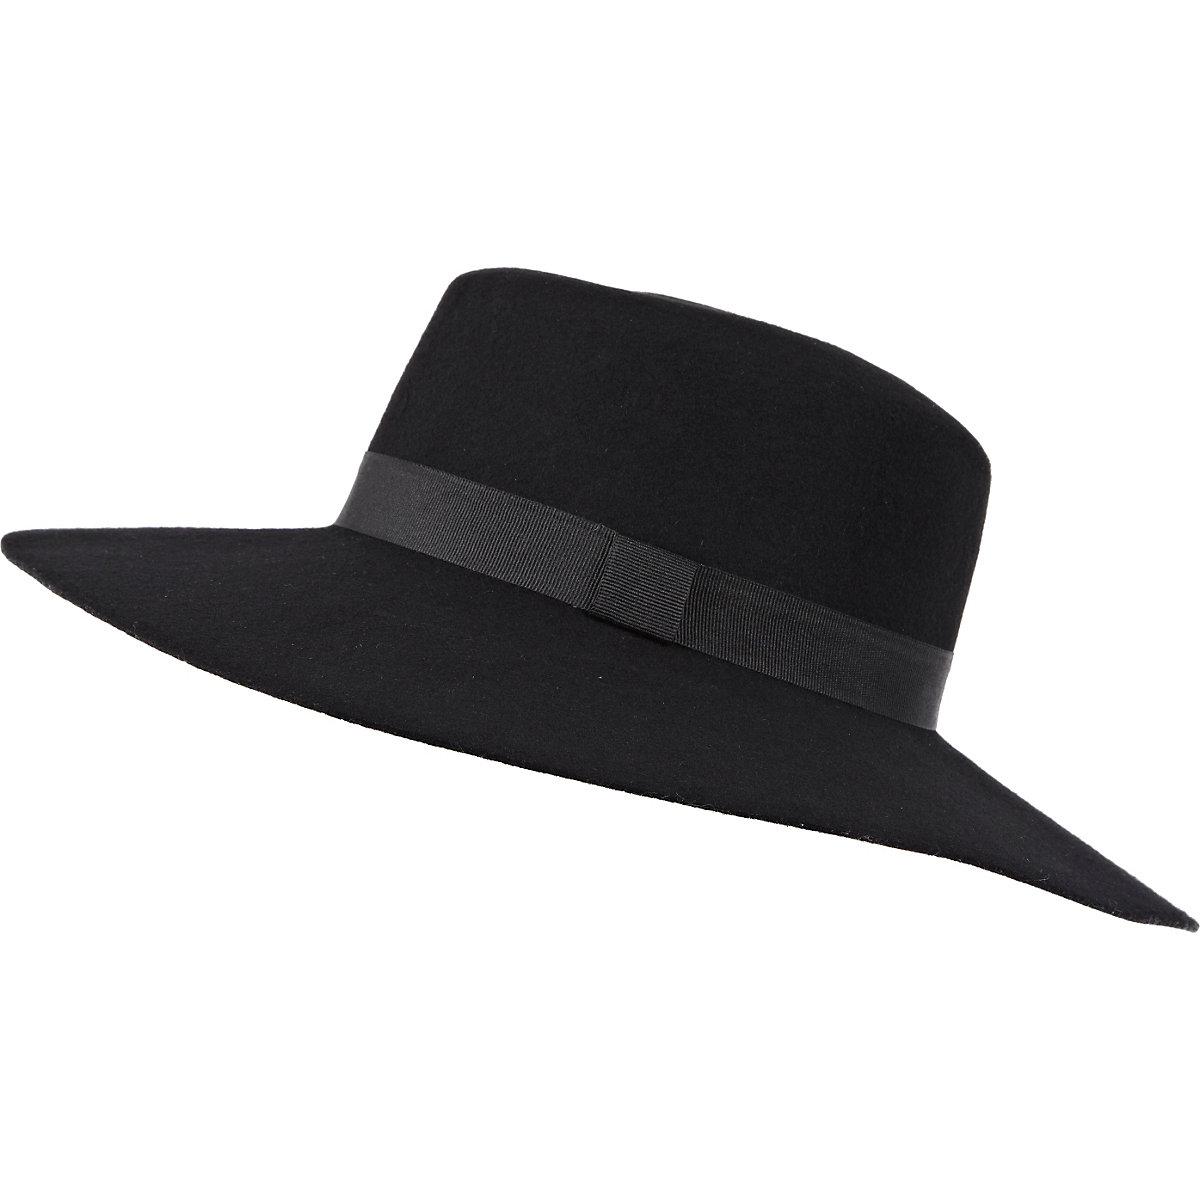 Black ribbon trim shaker hat